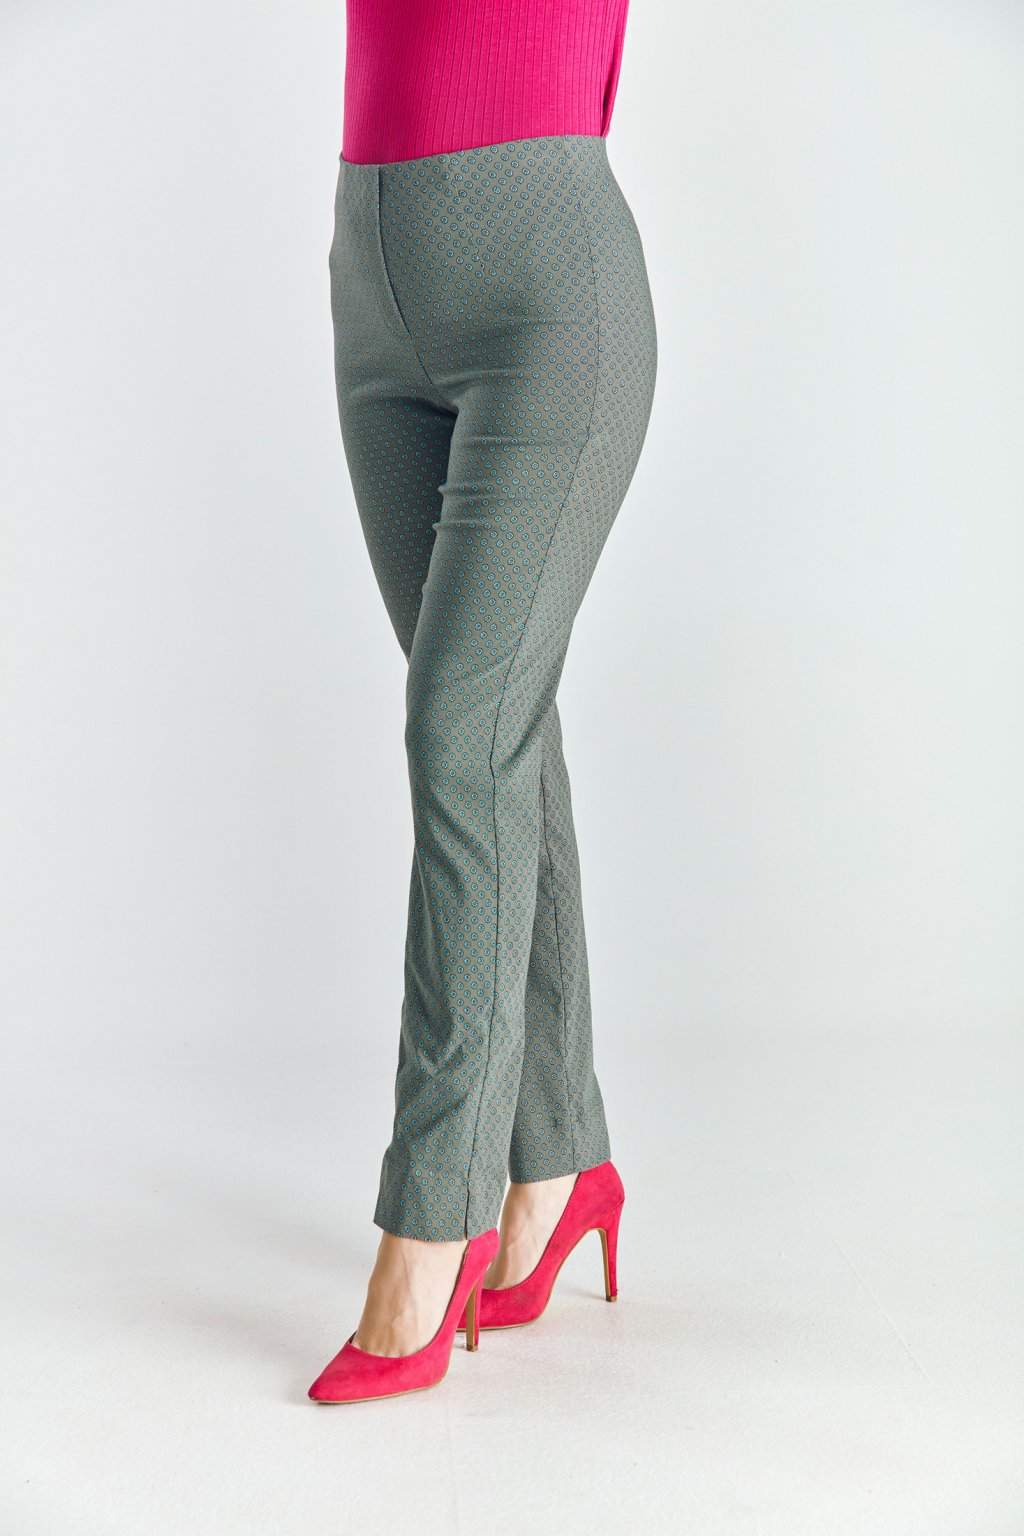 Dámské  kalhoty do gumy kytičky khaki